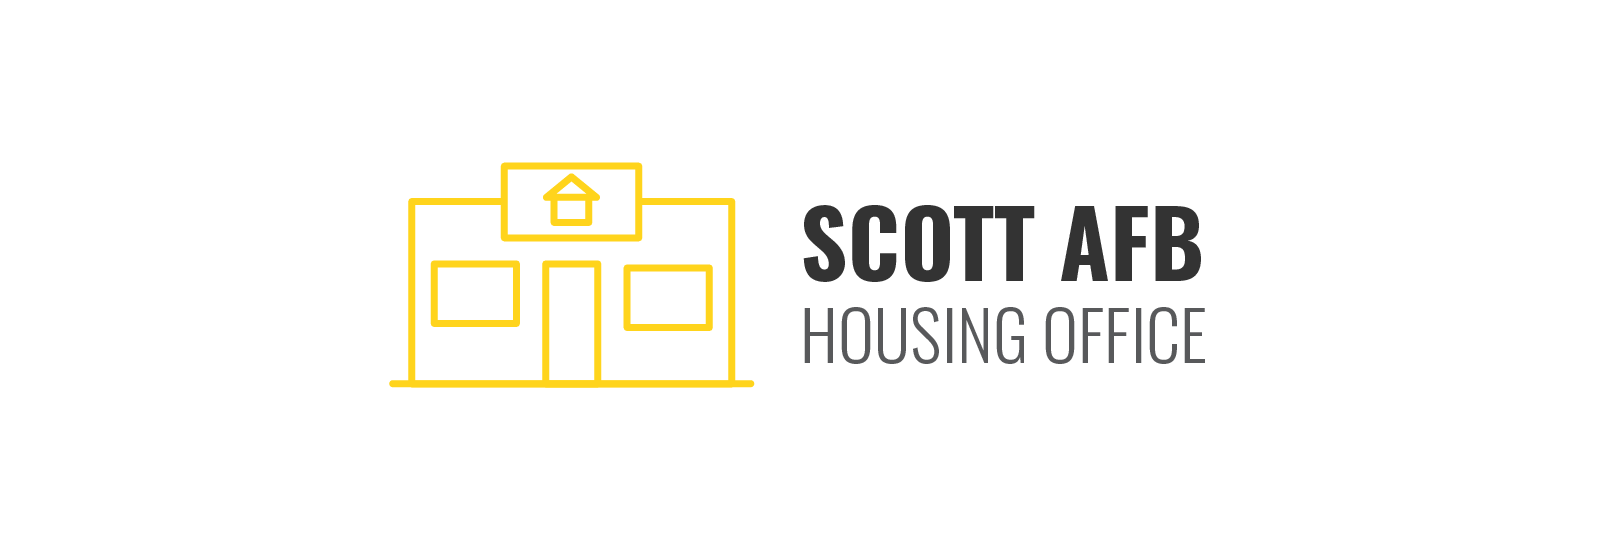 Scott AFB Housing Office